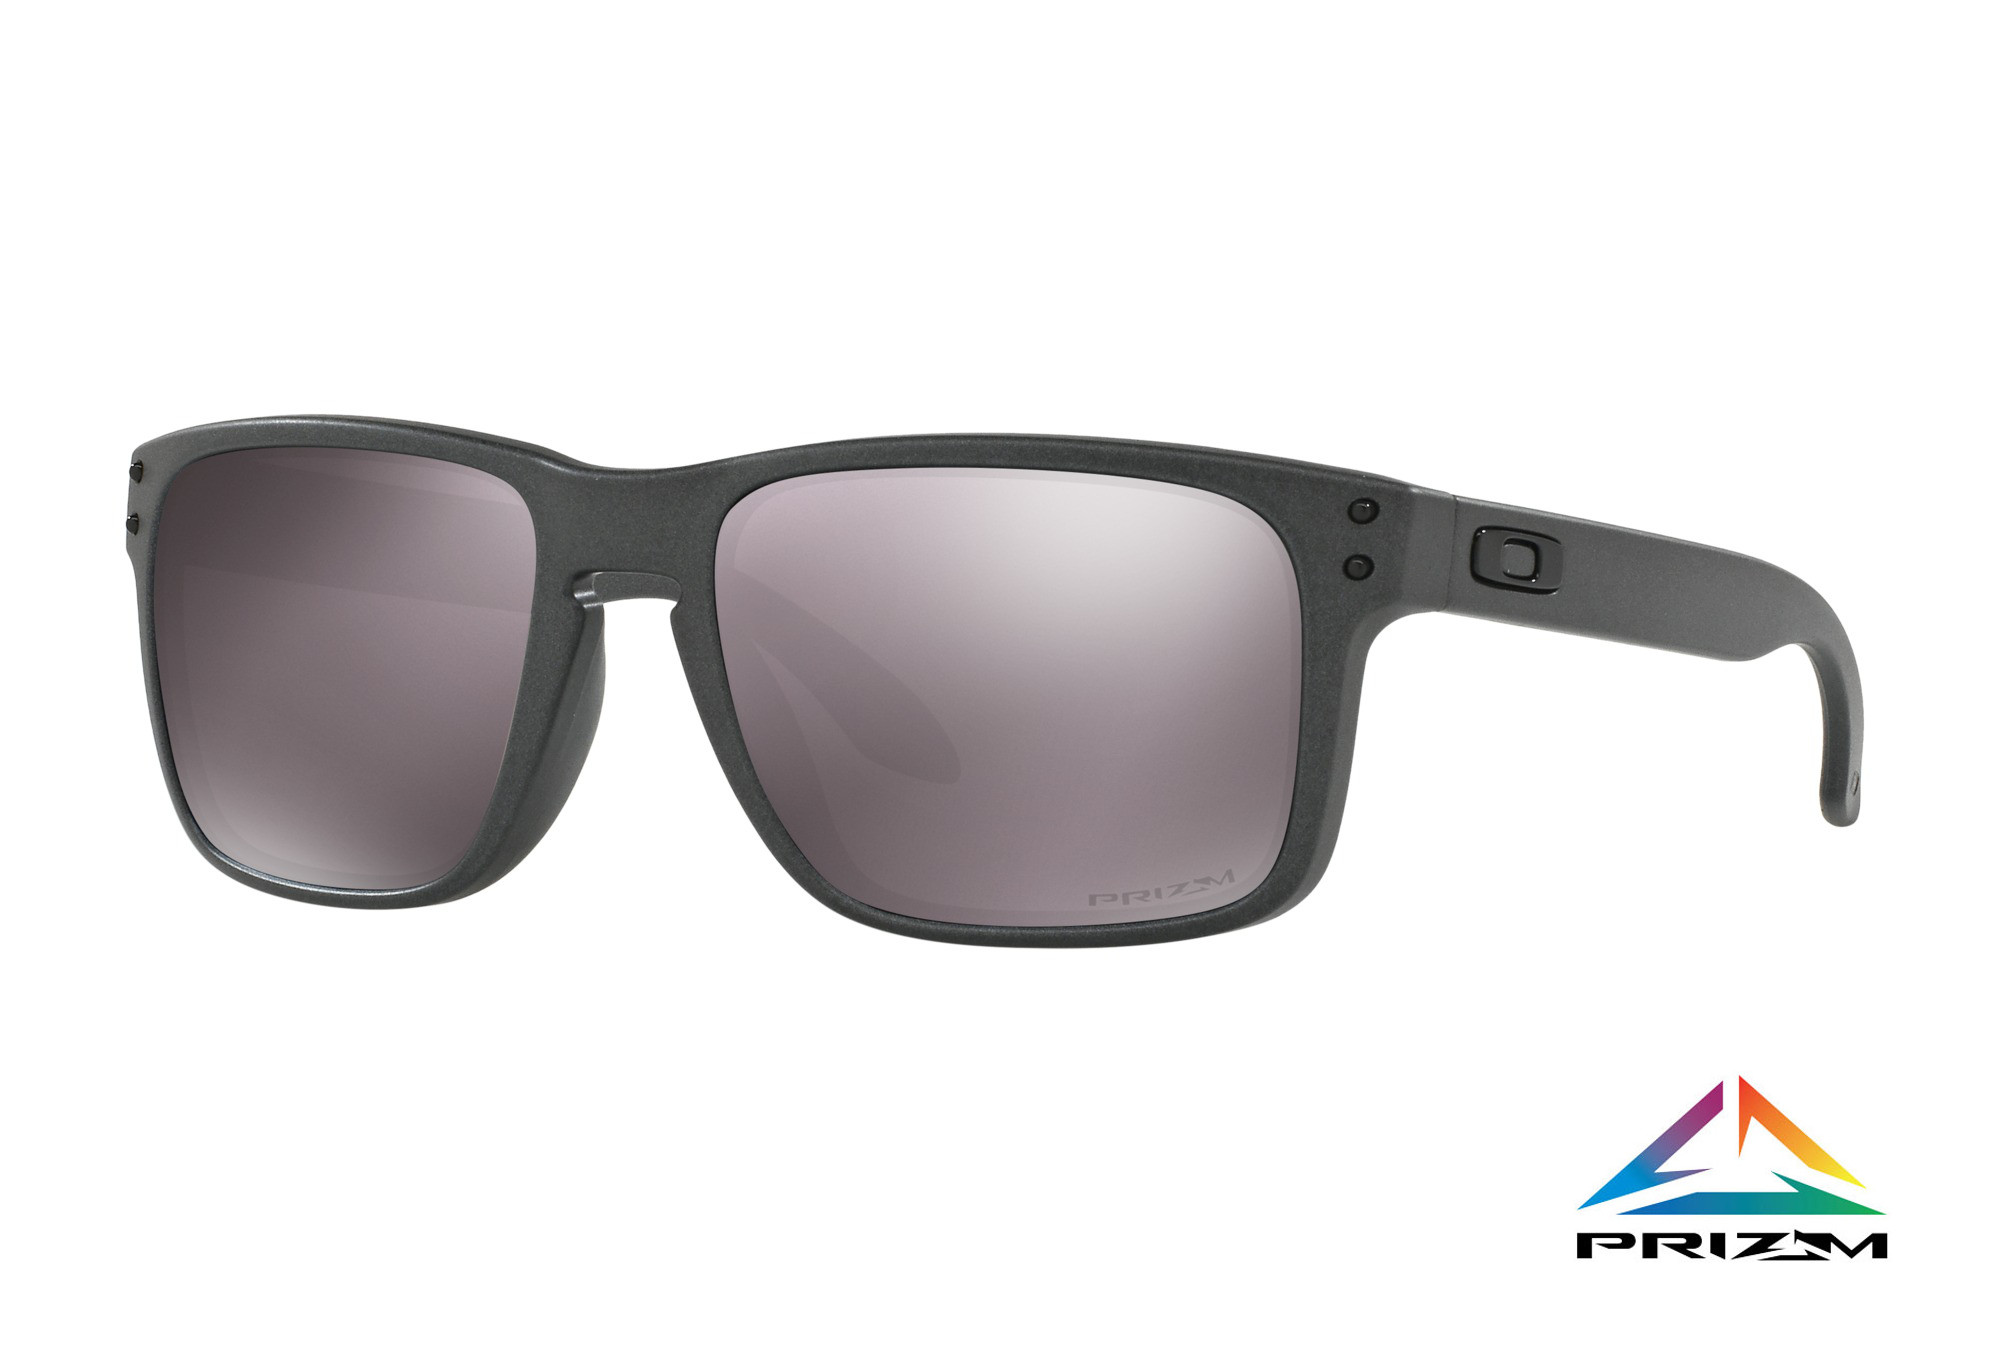 362cc214f8 OAKLEY Sunglasses HOLBROOK Steel   Prizm Daily Polarized Ref OO9102 ...